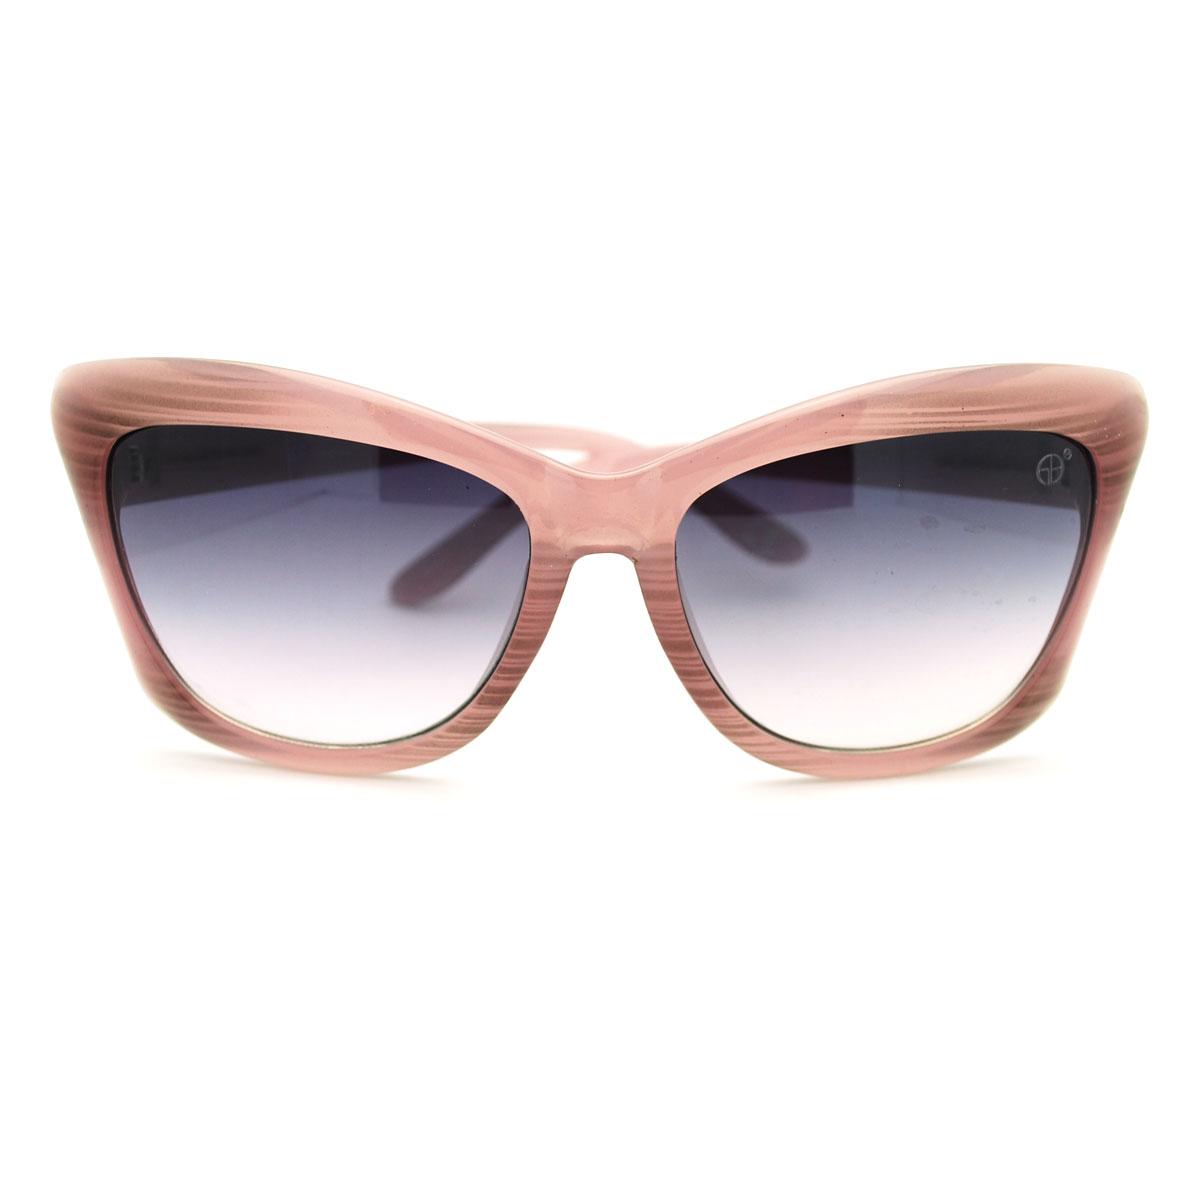 Womens Super Thick Plastic Frame Cat Eye Oversized Sunglasses